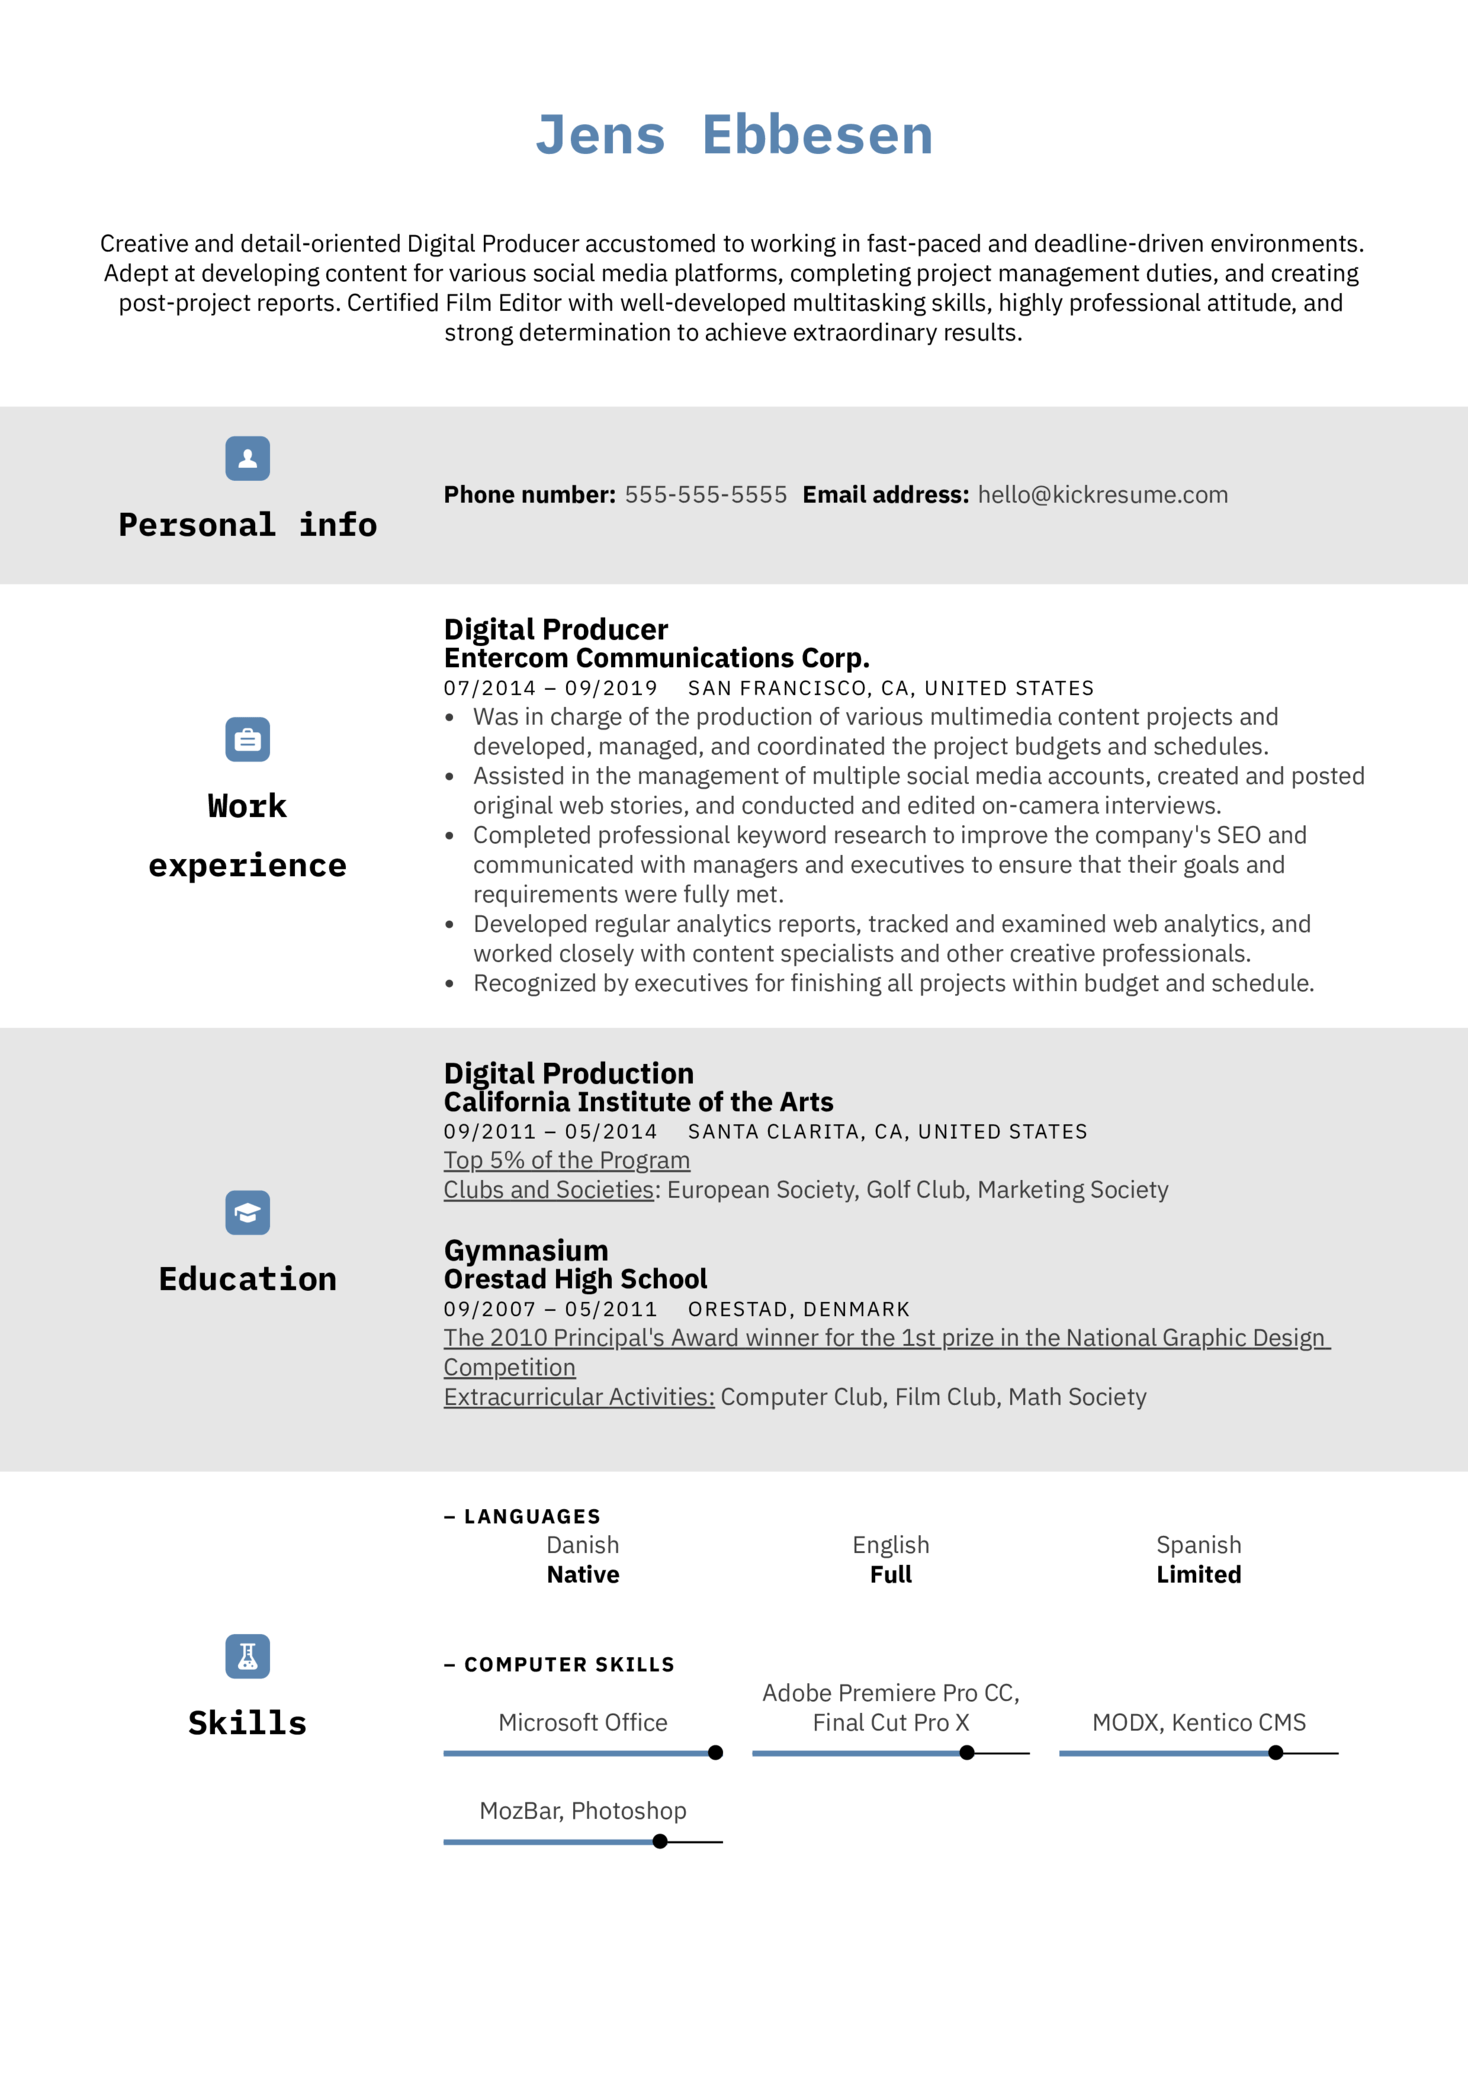 Digital Producer Resume Sample (Teil 1)